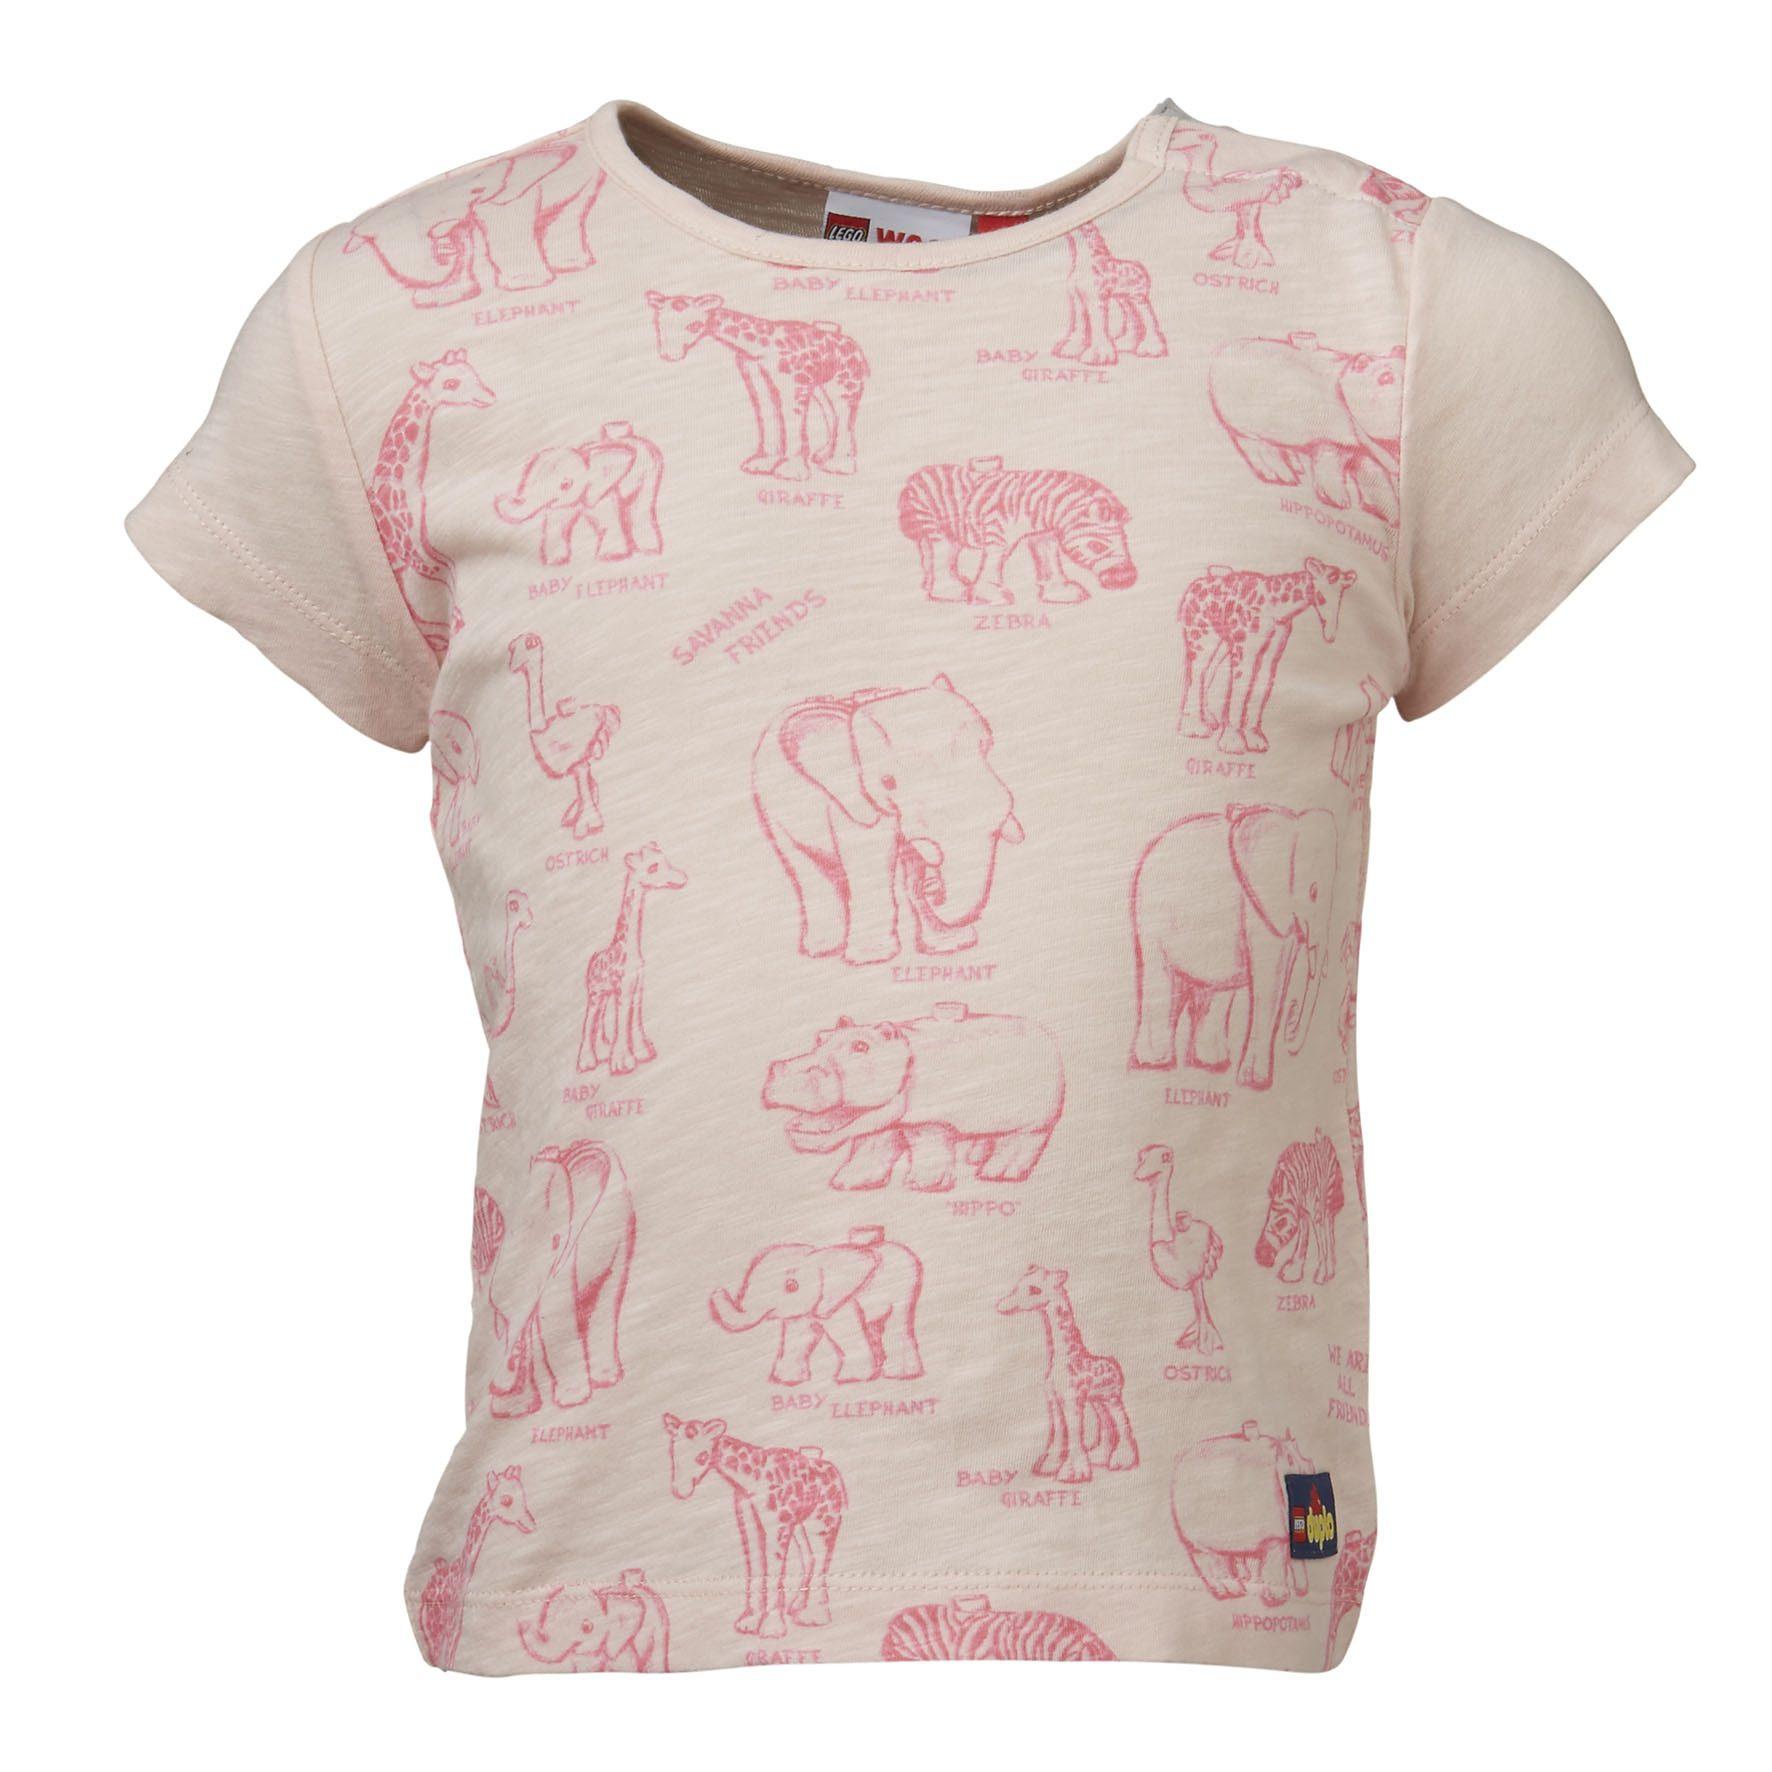 "LEGO Wear Duplo T-Shirt ""Wildlife"" kurzarm Shirt Tiff"